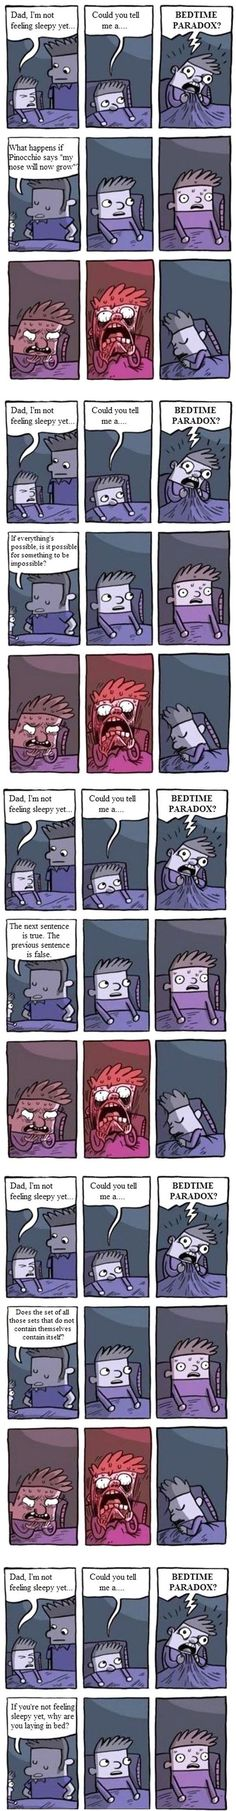 Bedtime Paradox Compilation